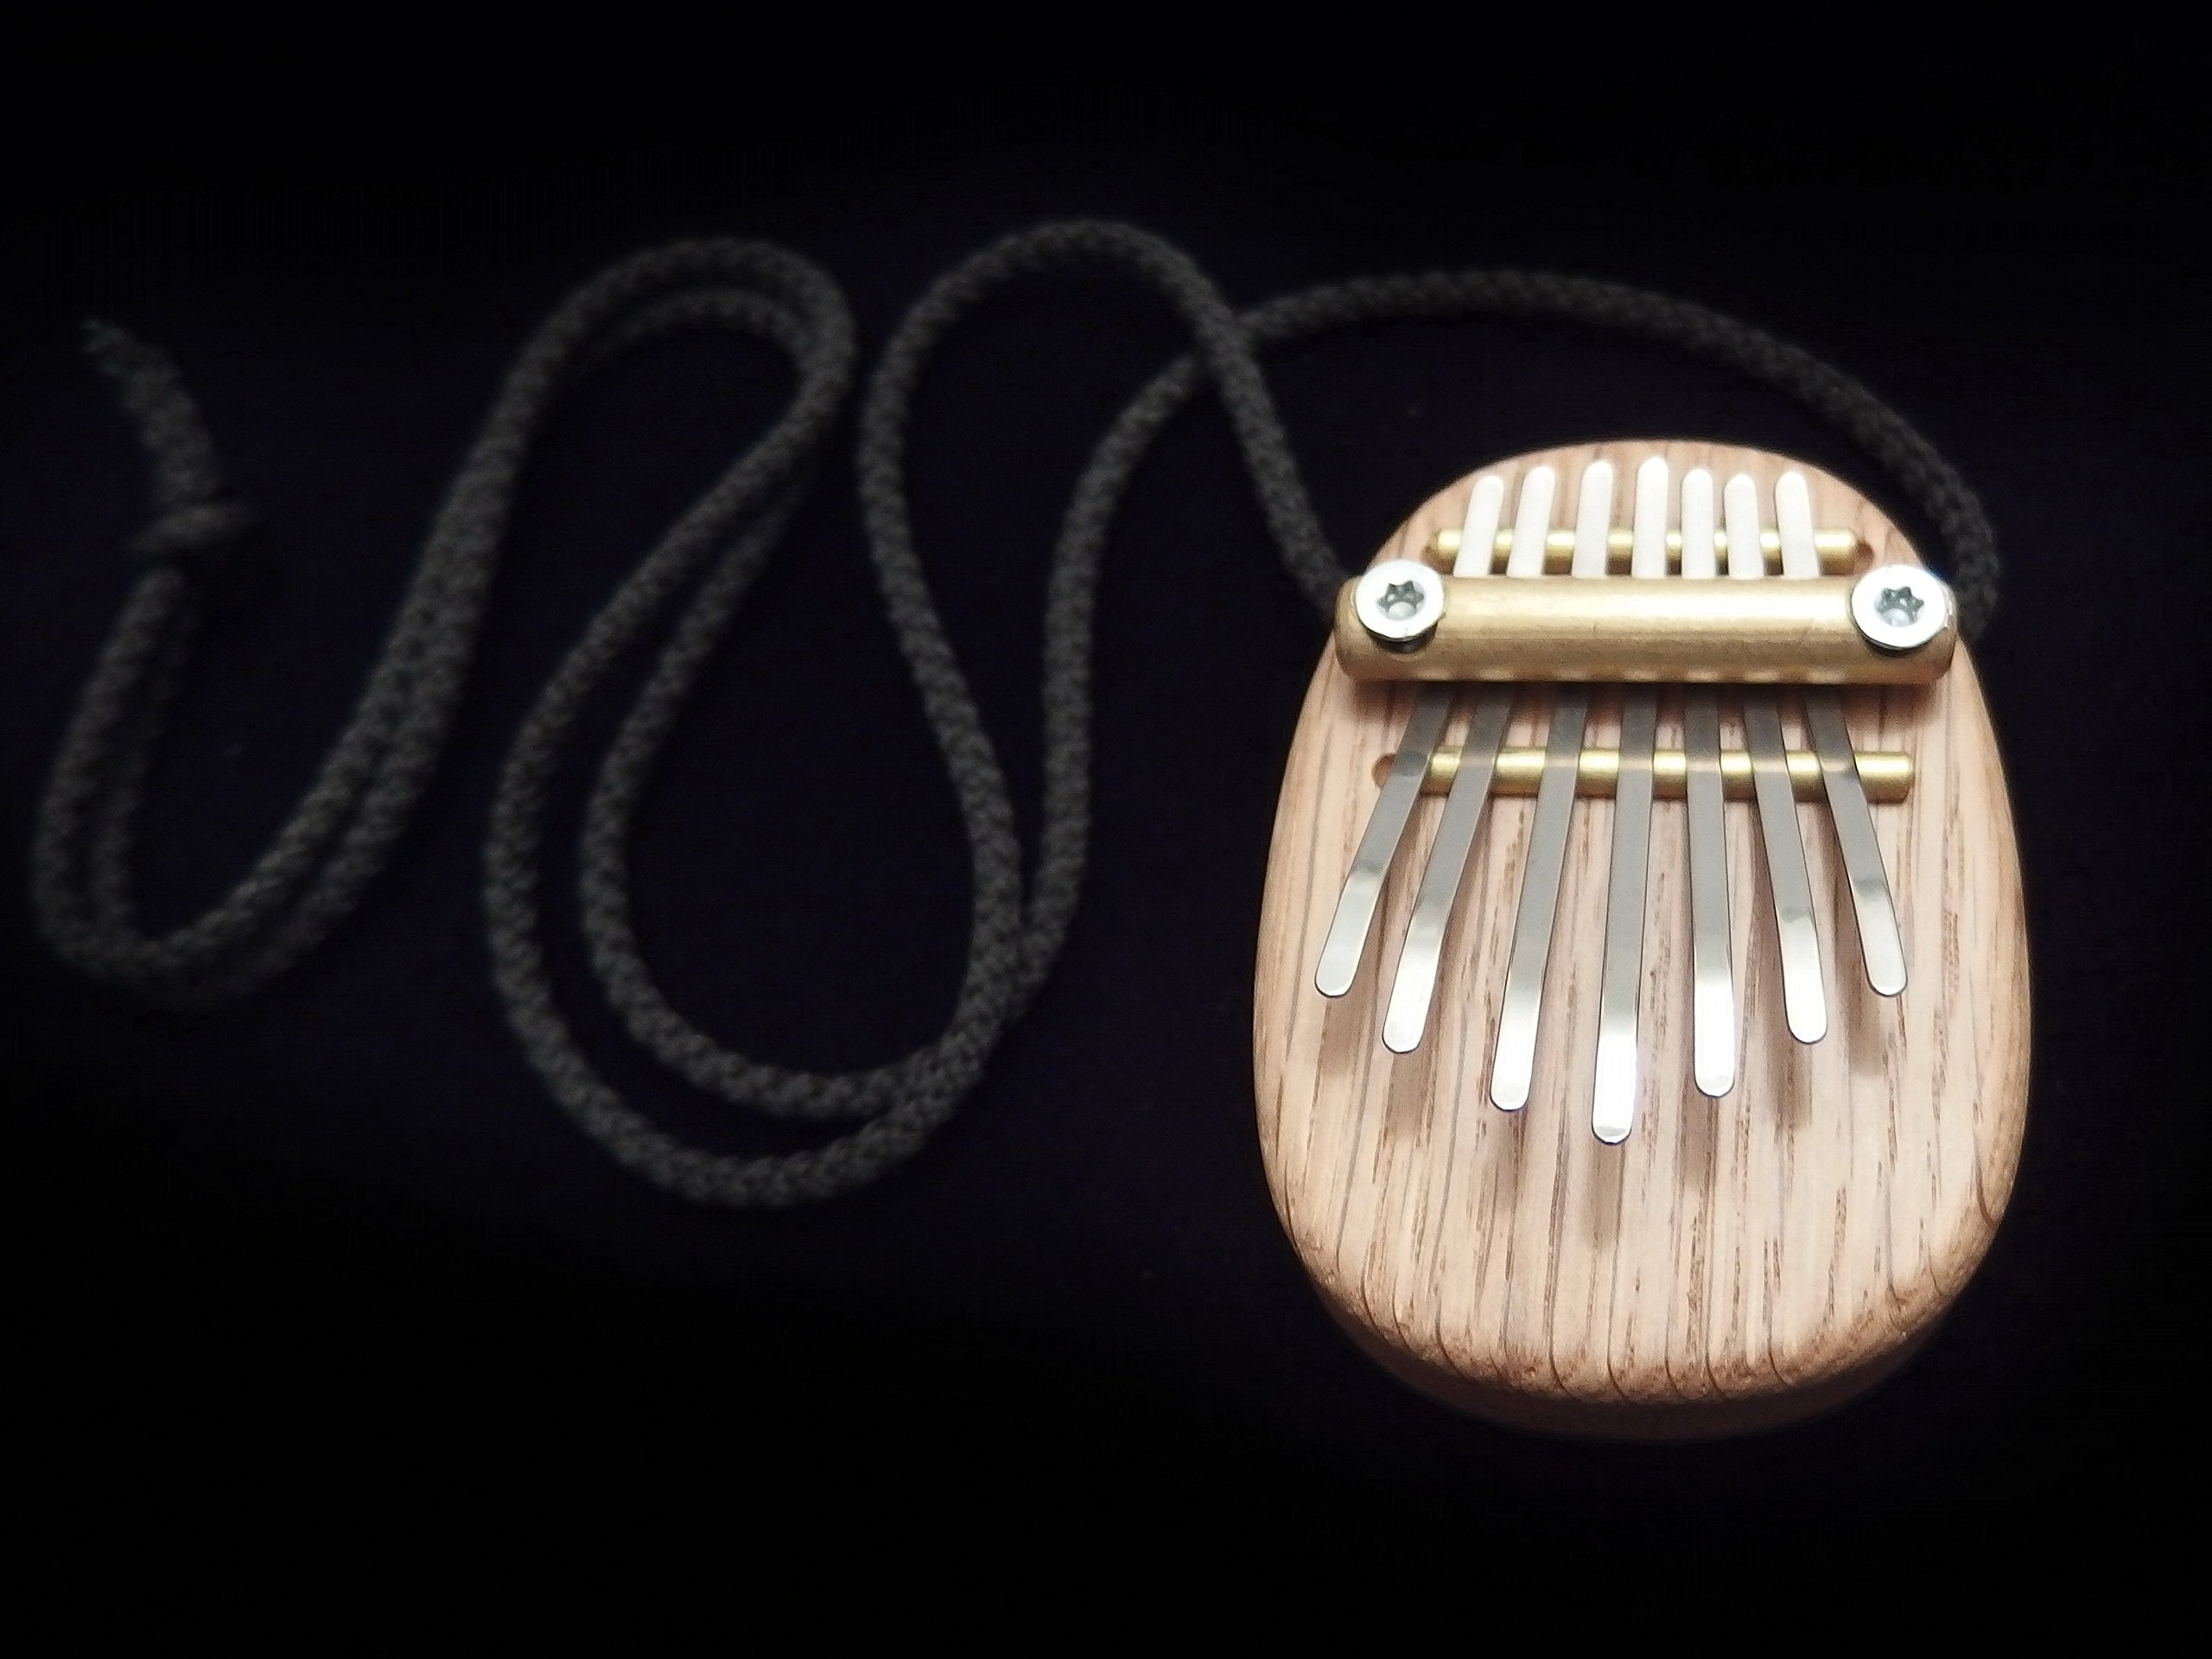 Kalimba Shamanic Mini (in case) Sansula Thumb Piano Great sound by Shamanicshop (Image #7)